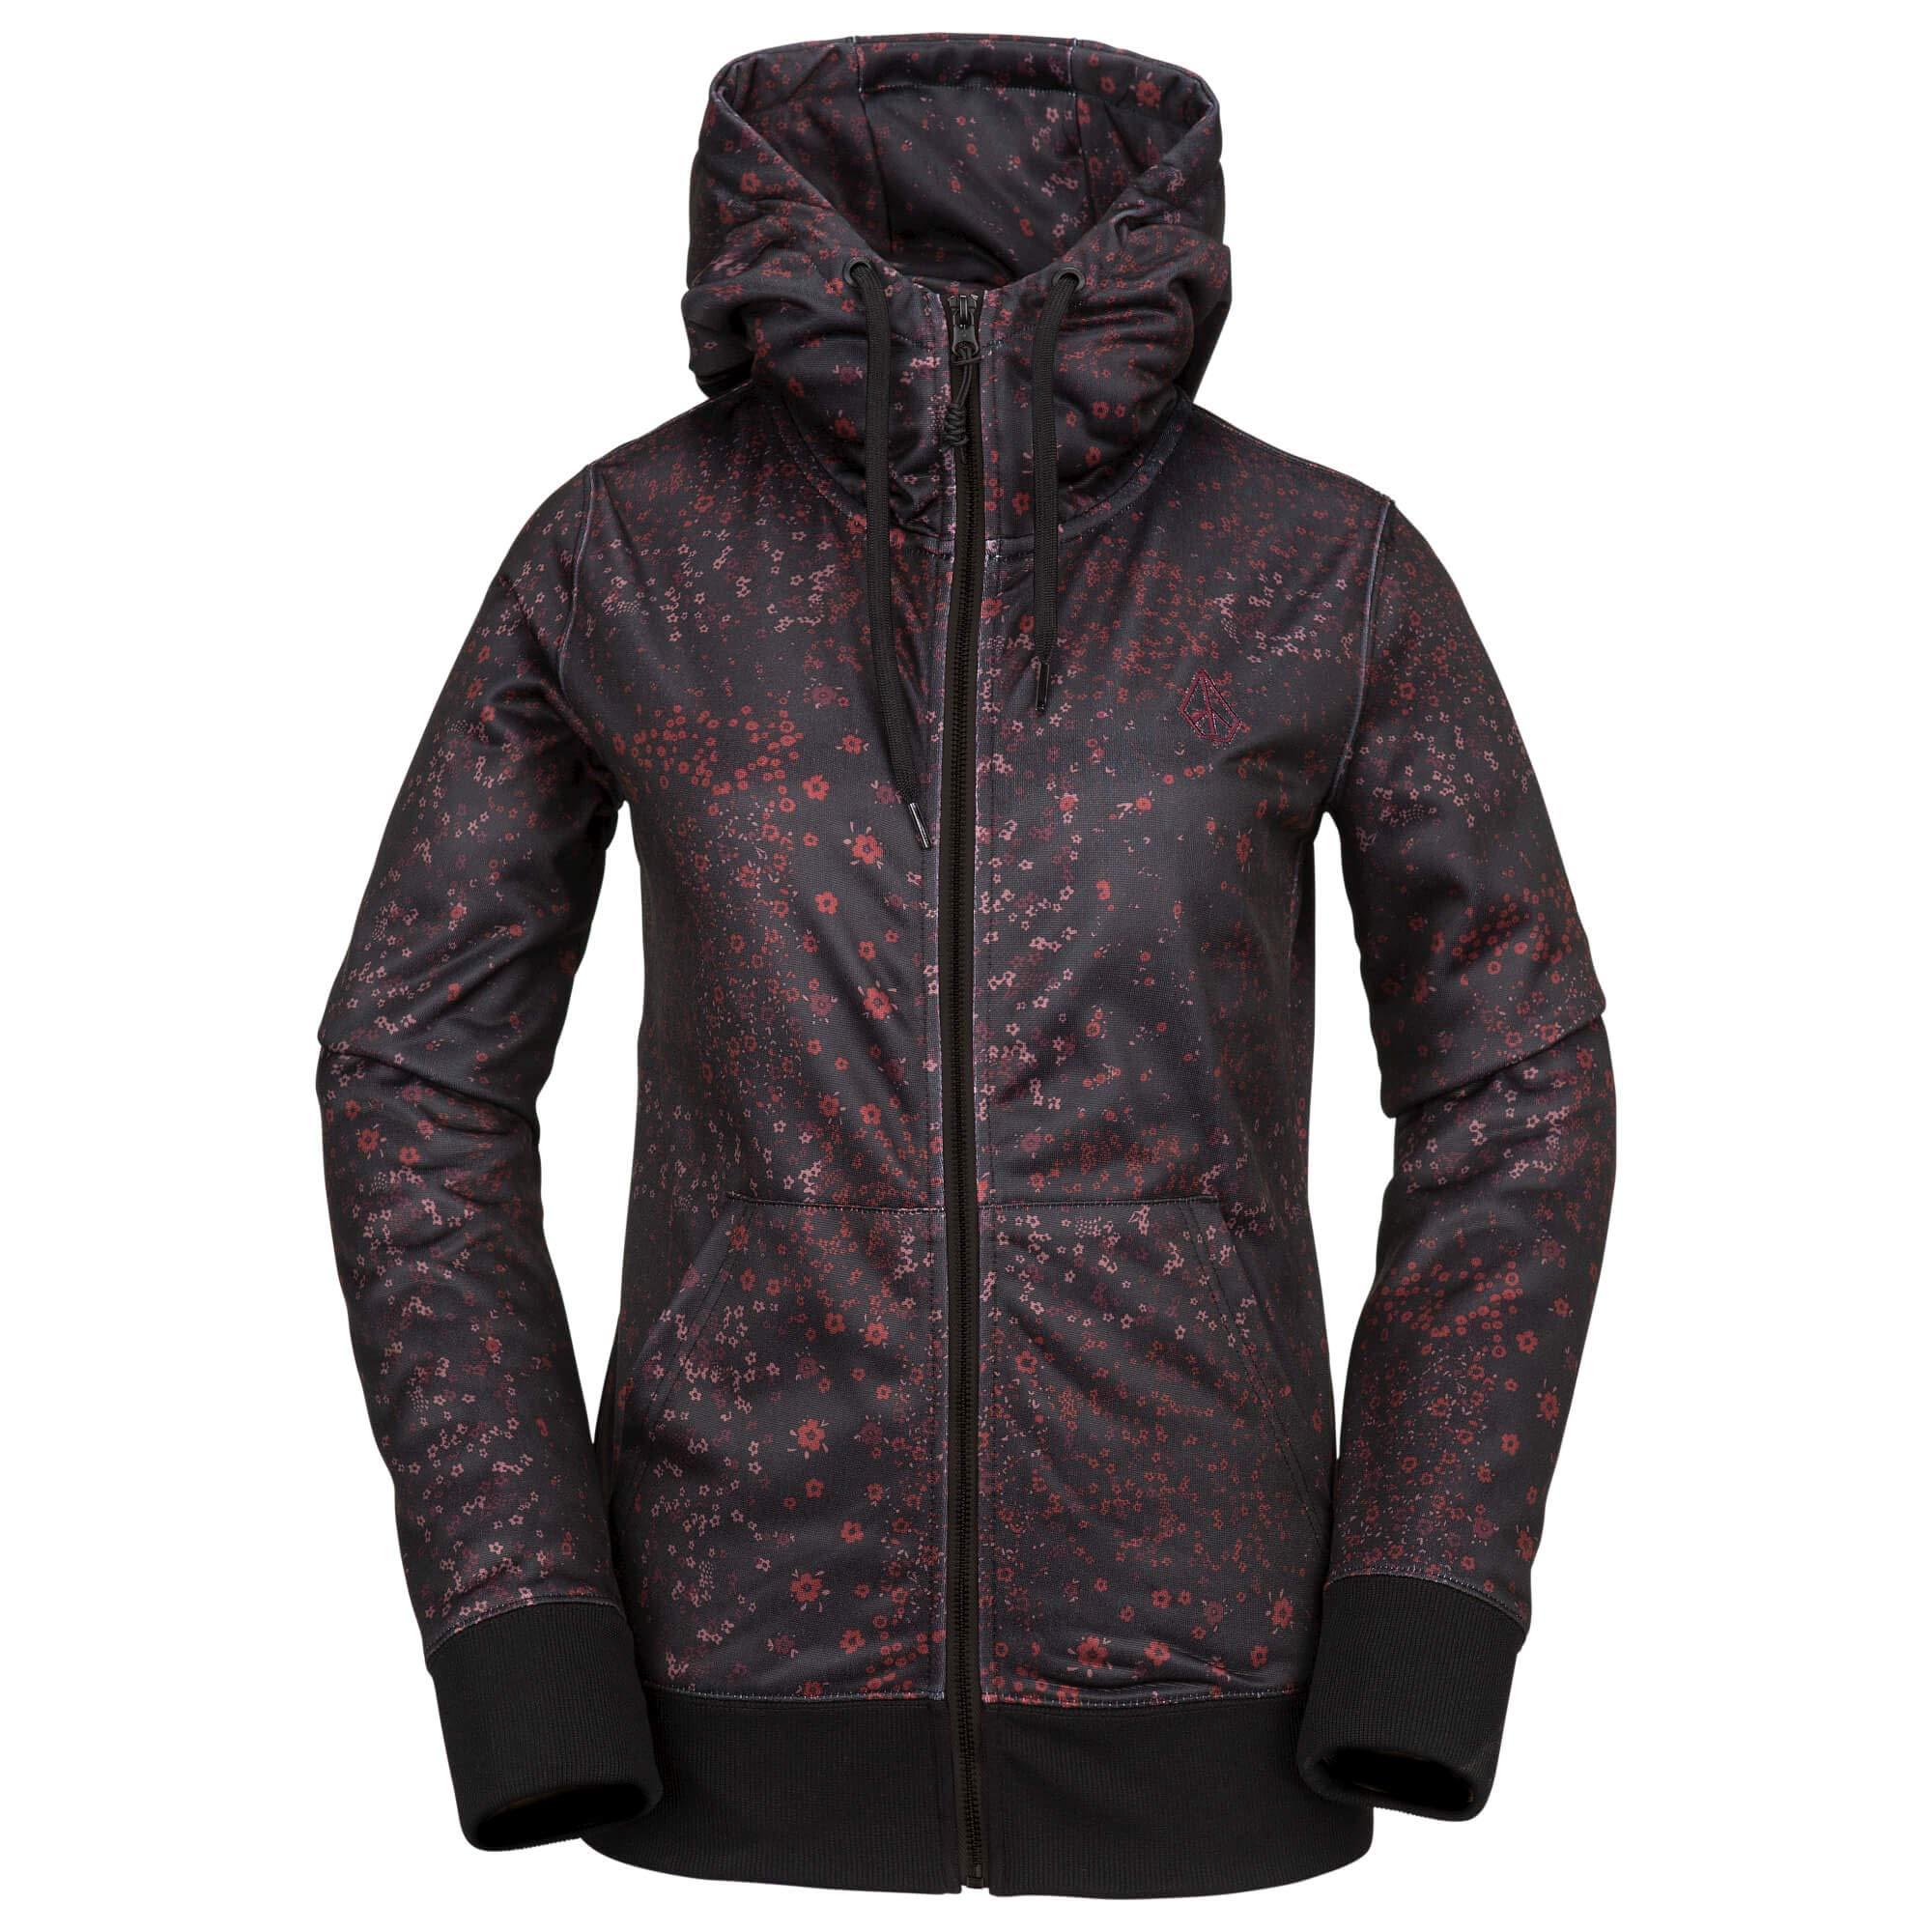 Volcom Women's Cascara Baselayer Hydrophobic Fleece Hooded Sweatshirt, Black Floral Print, Extra Large